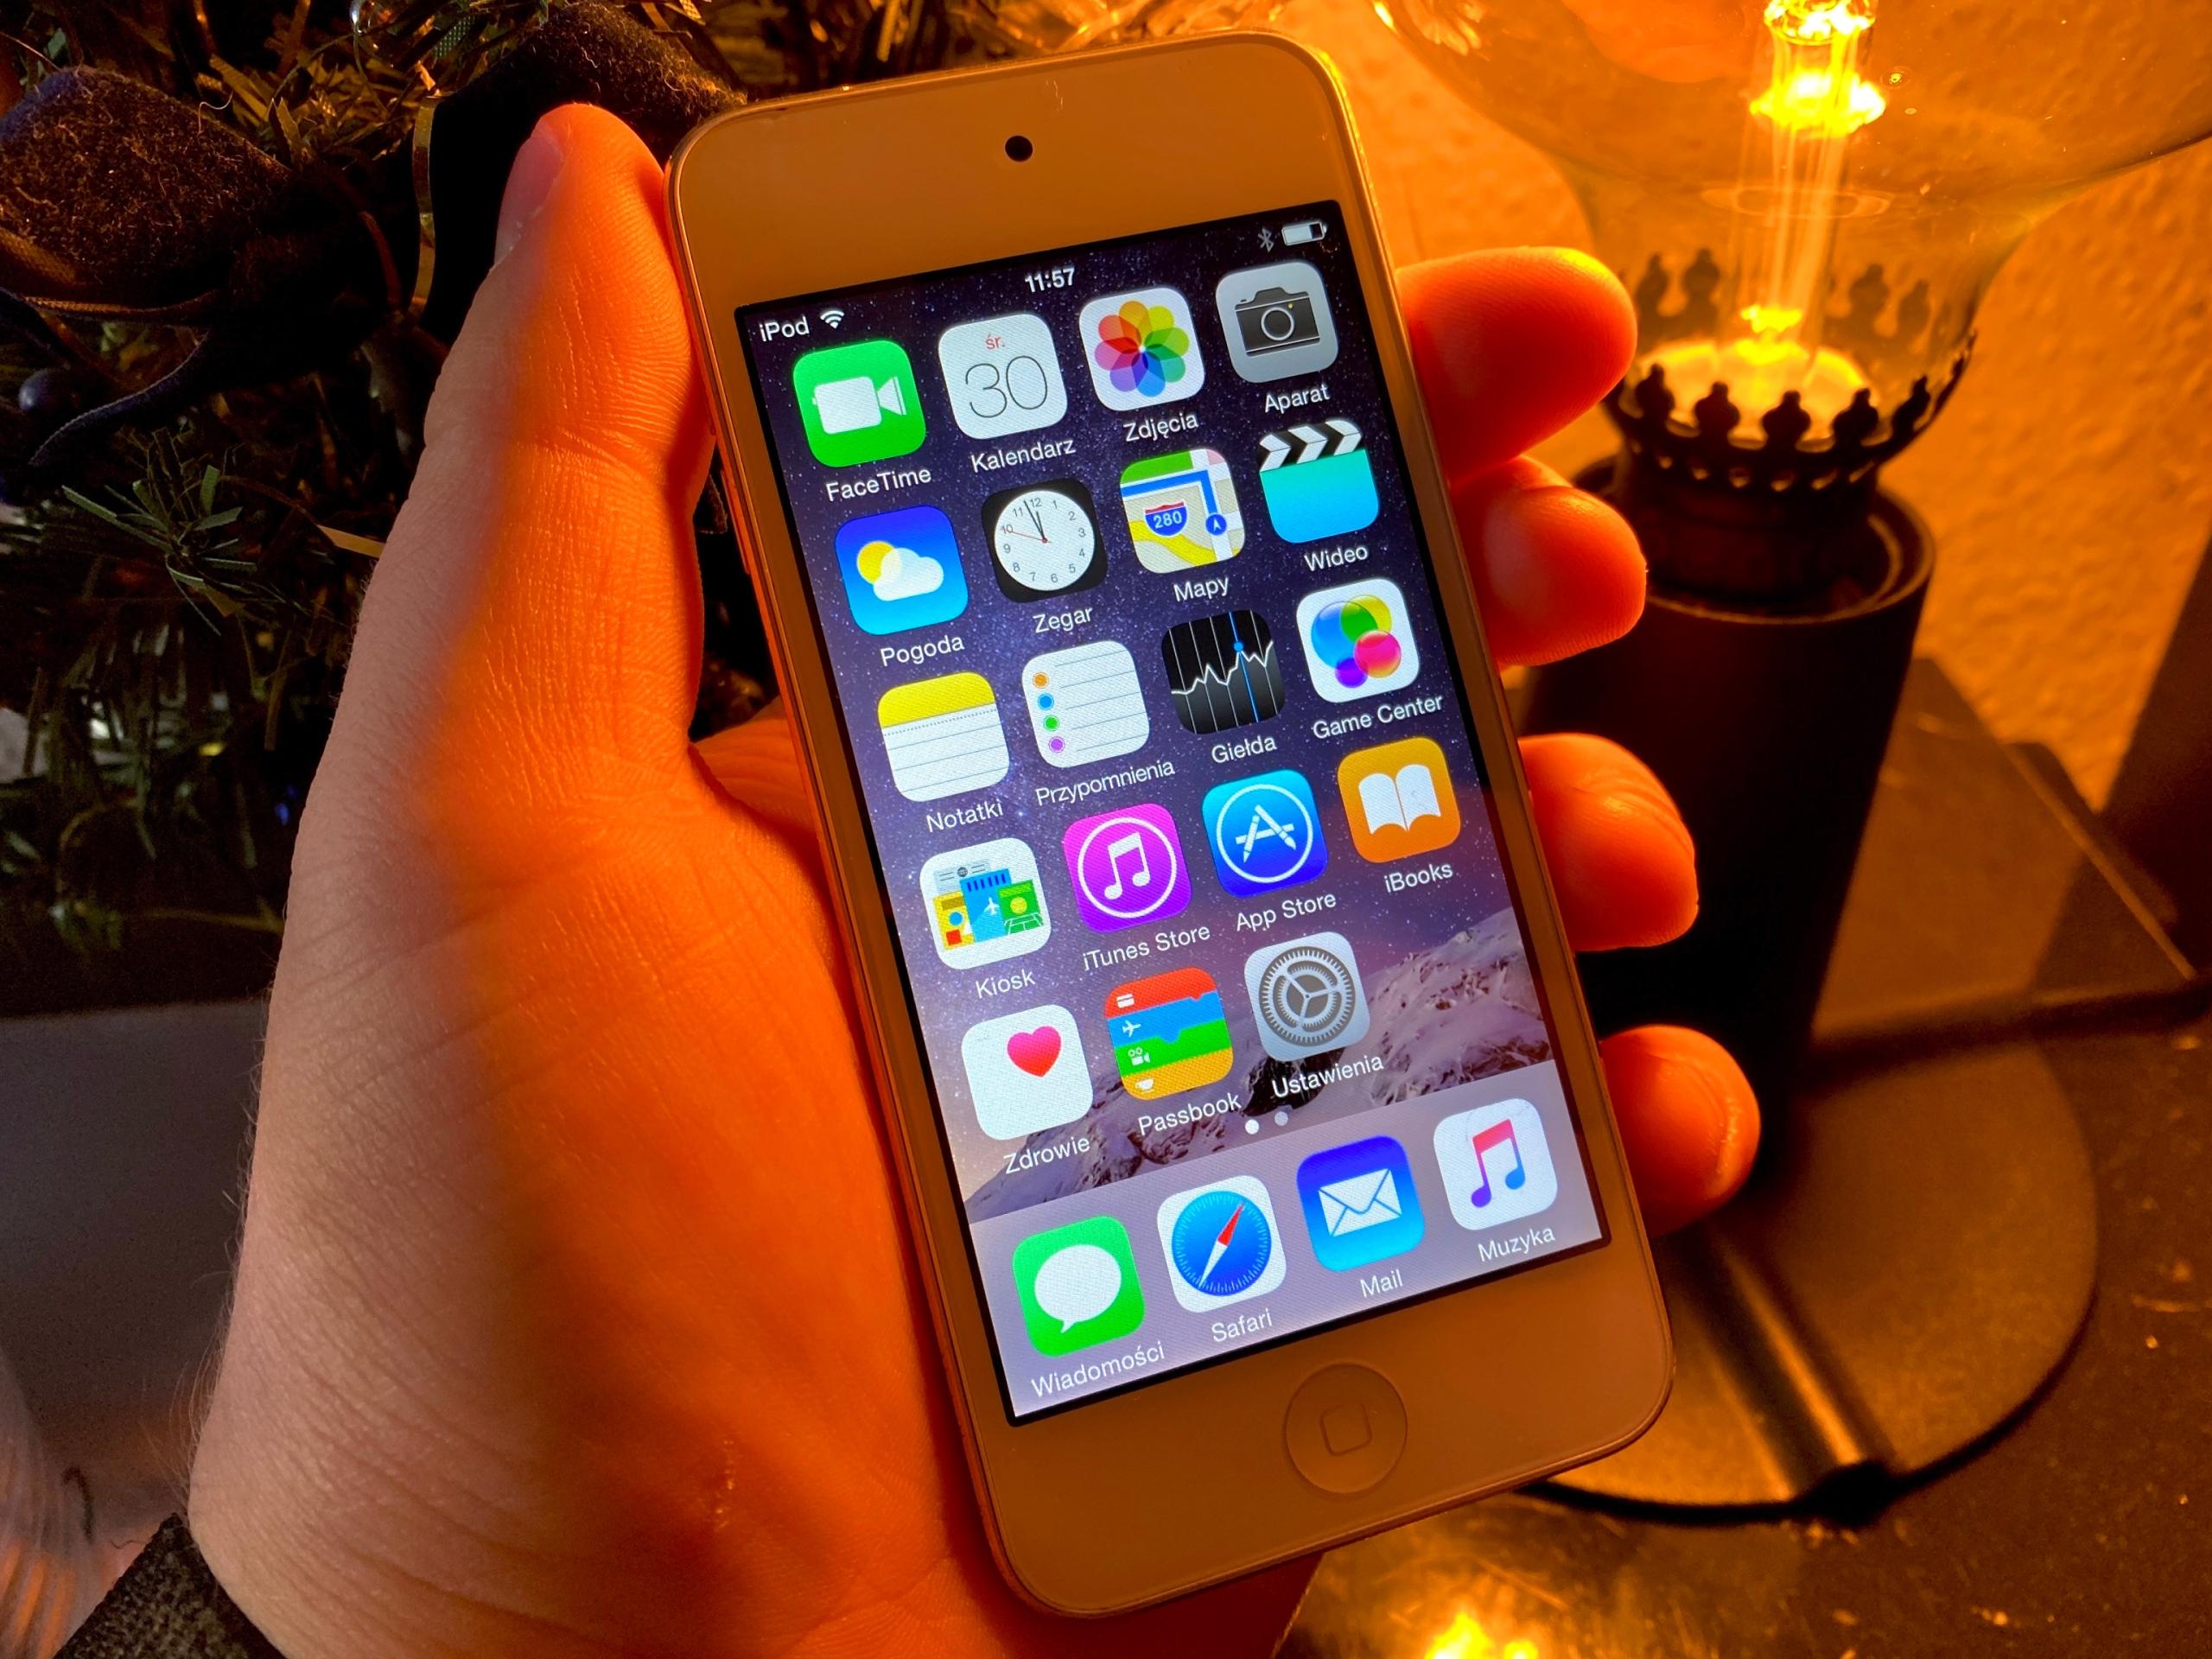 Ipod Touch 5g 16gb Bez Icloud Ios 8 4 1 Kup Teraz Za 199 00 Zl Torun Allegro Lokalnie